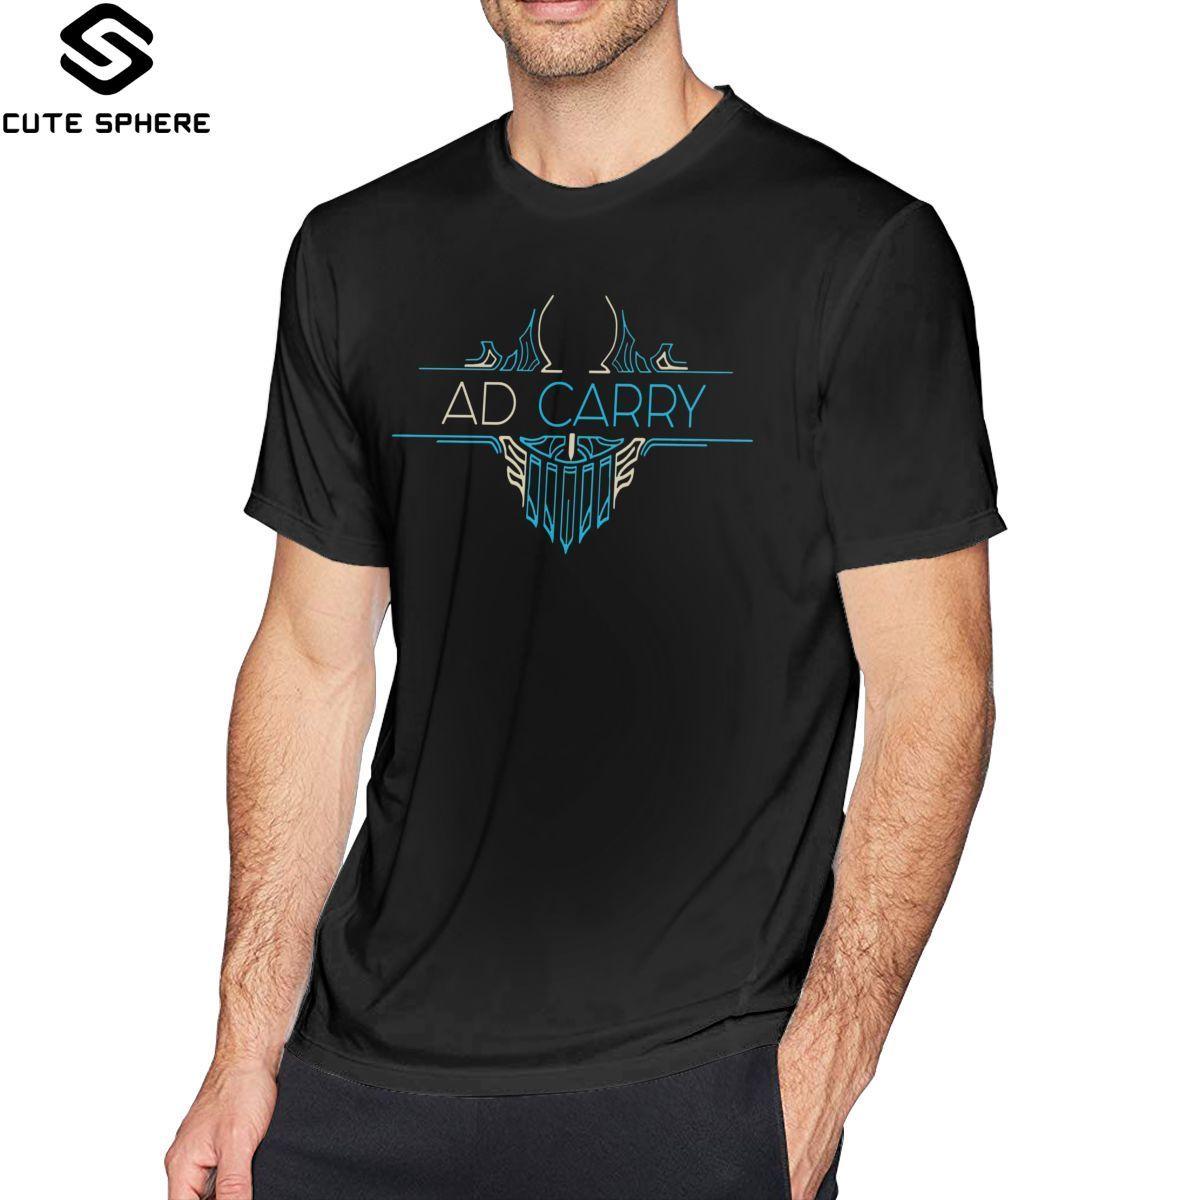 Jinx Lol T Shirt AD Carry League Of Legends LOL Penta T-Shirt Short Sleeve Fashion Tee Shirt Oversized Tshirt